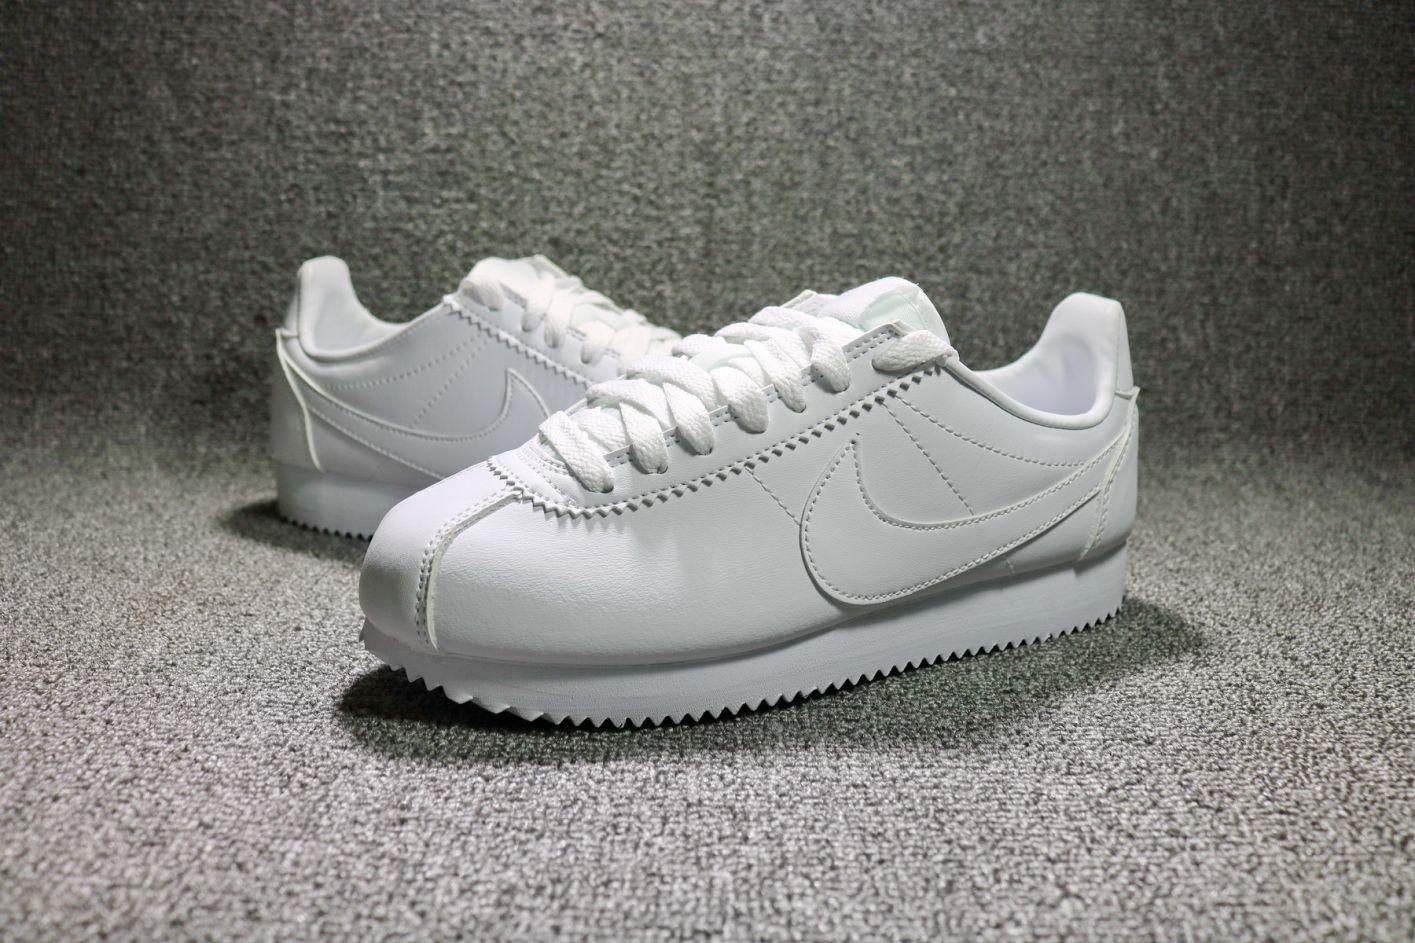 12-giay-sneaker-trang-elleman